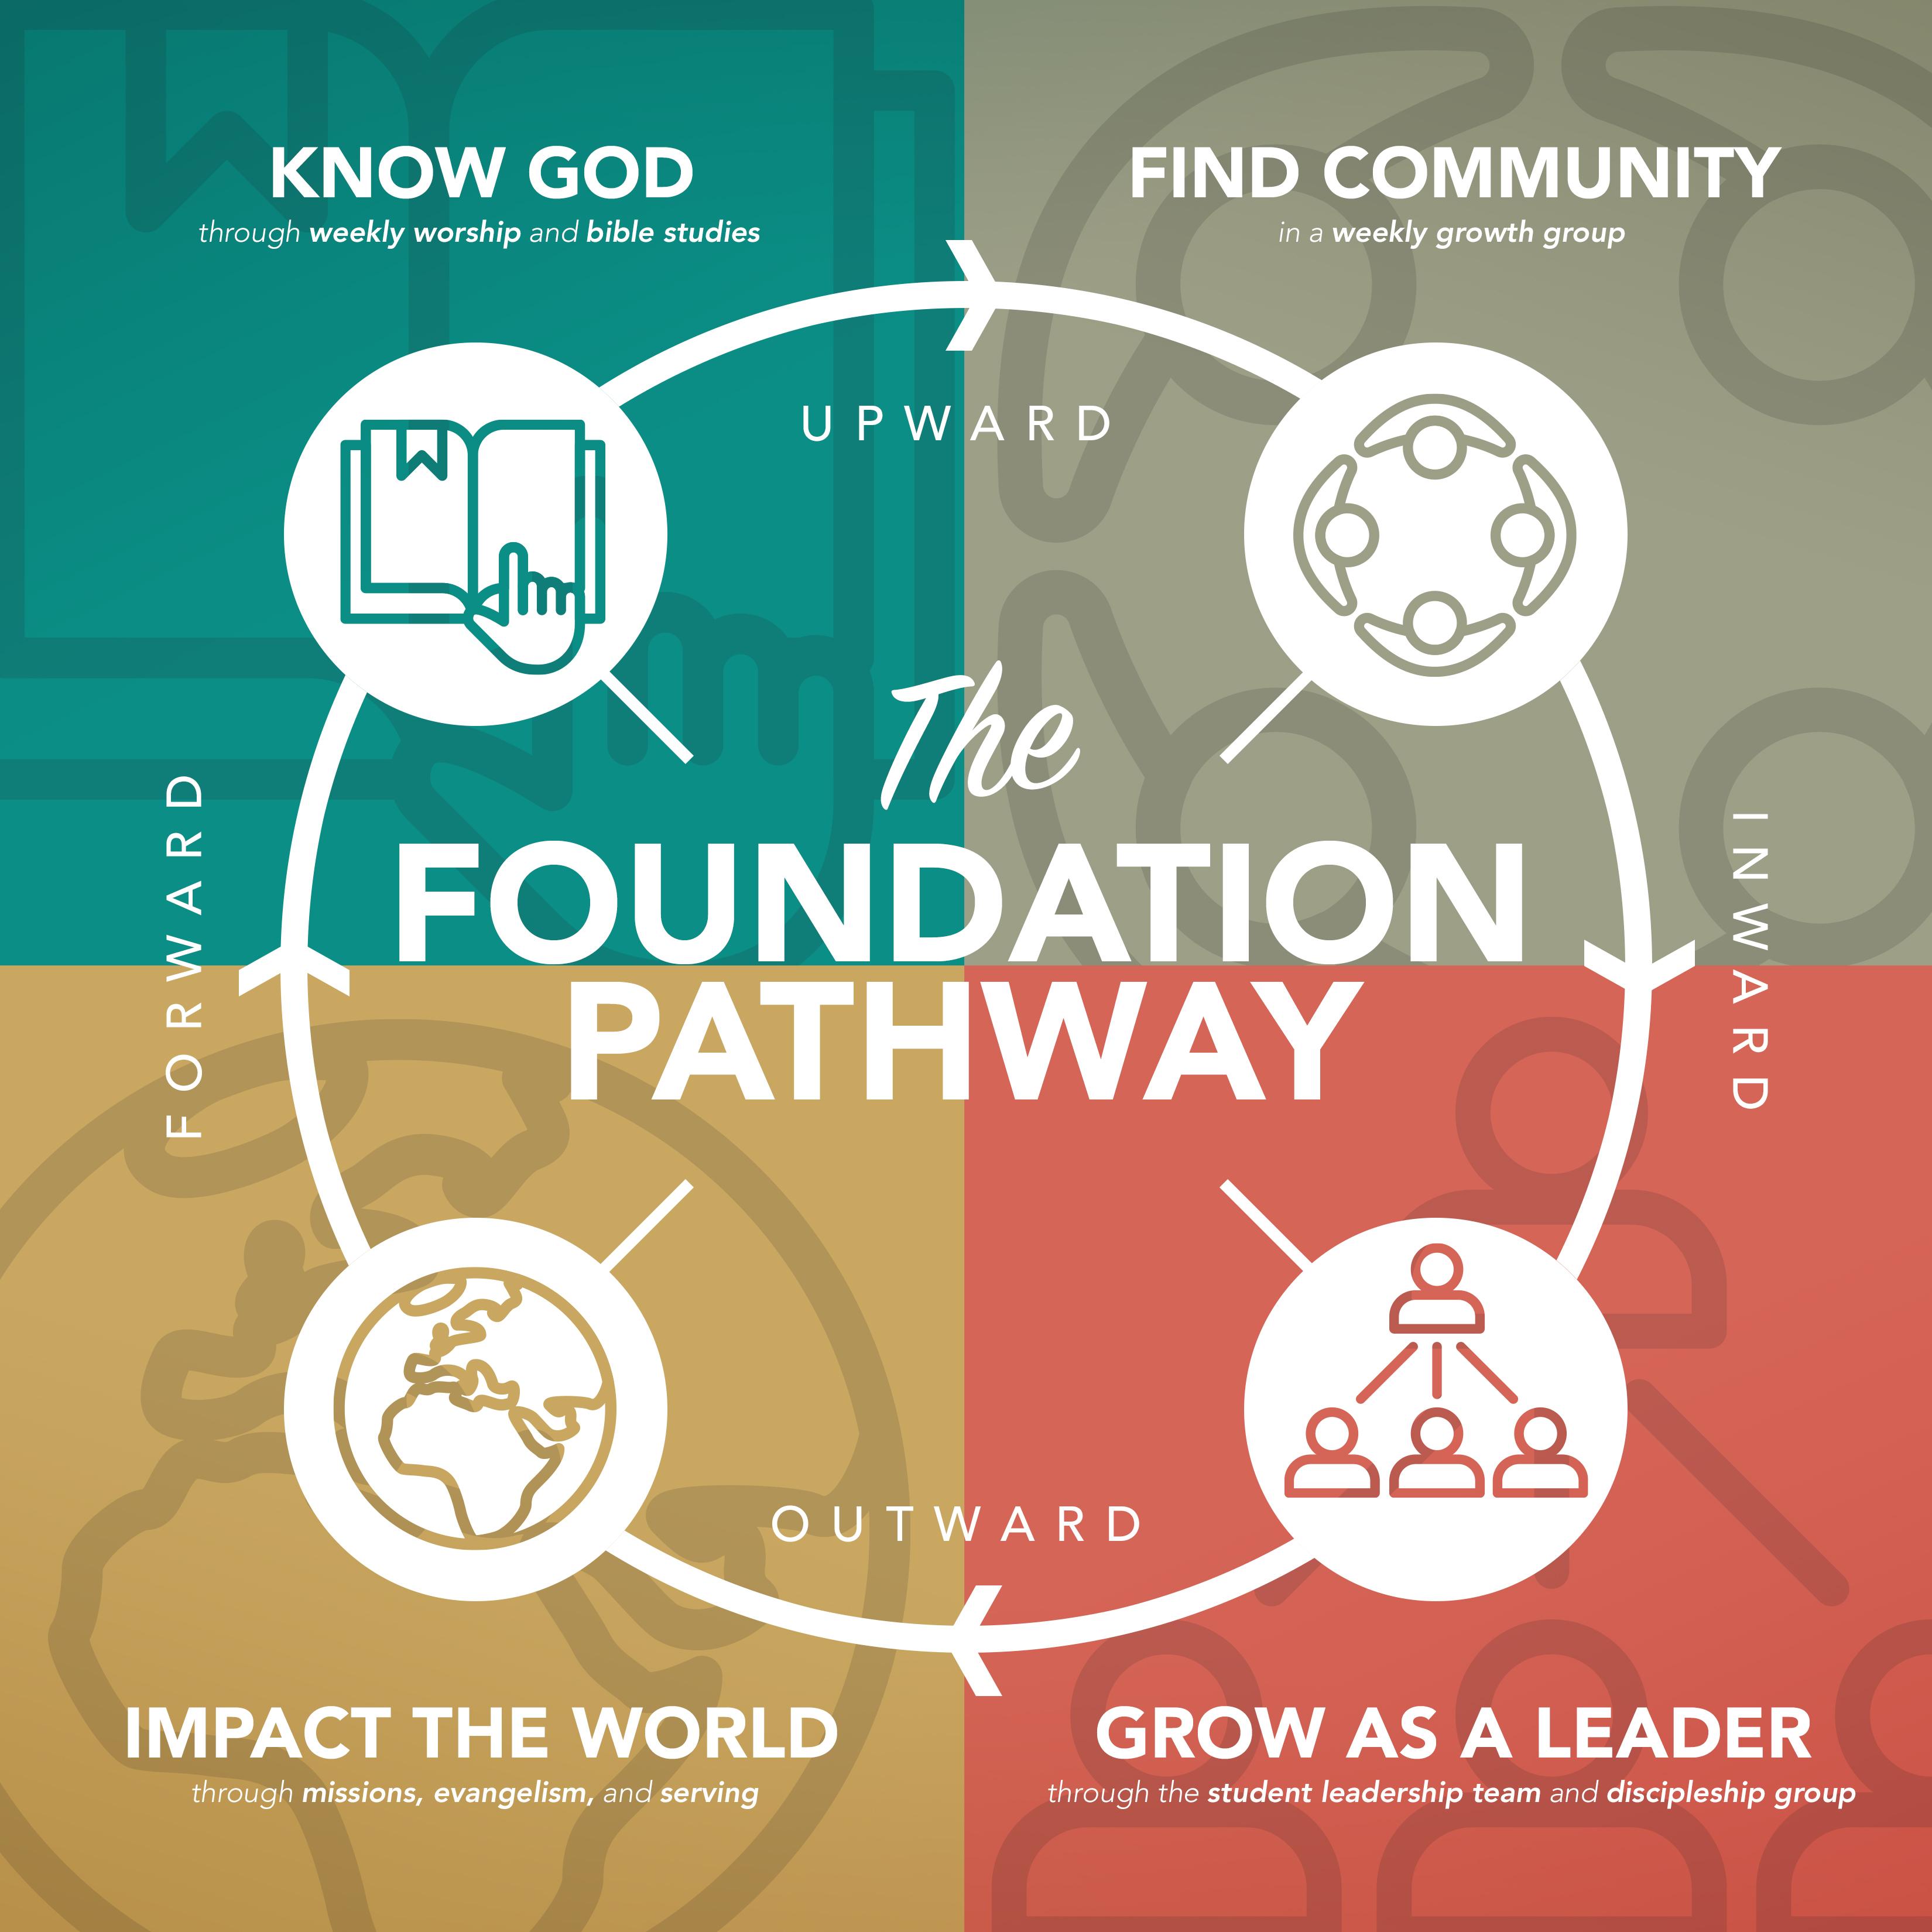 foundationpathway.jpg